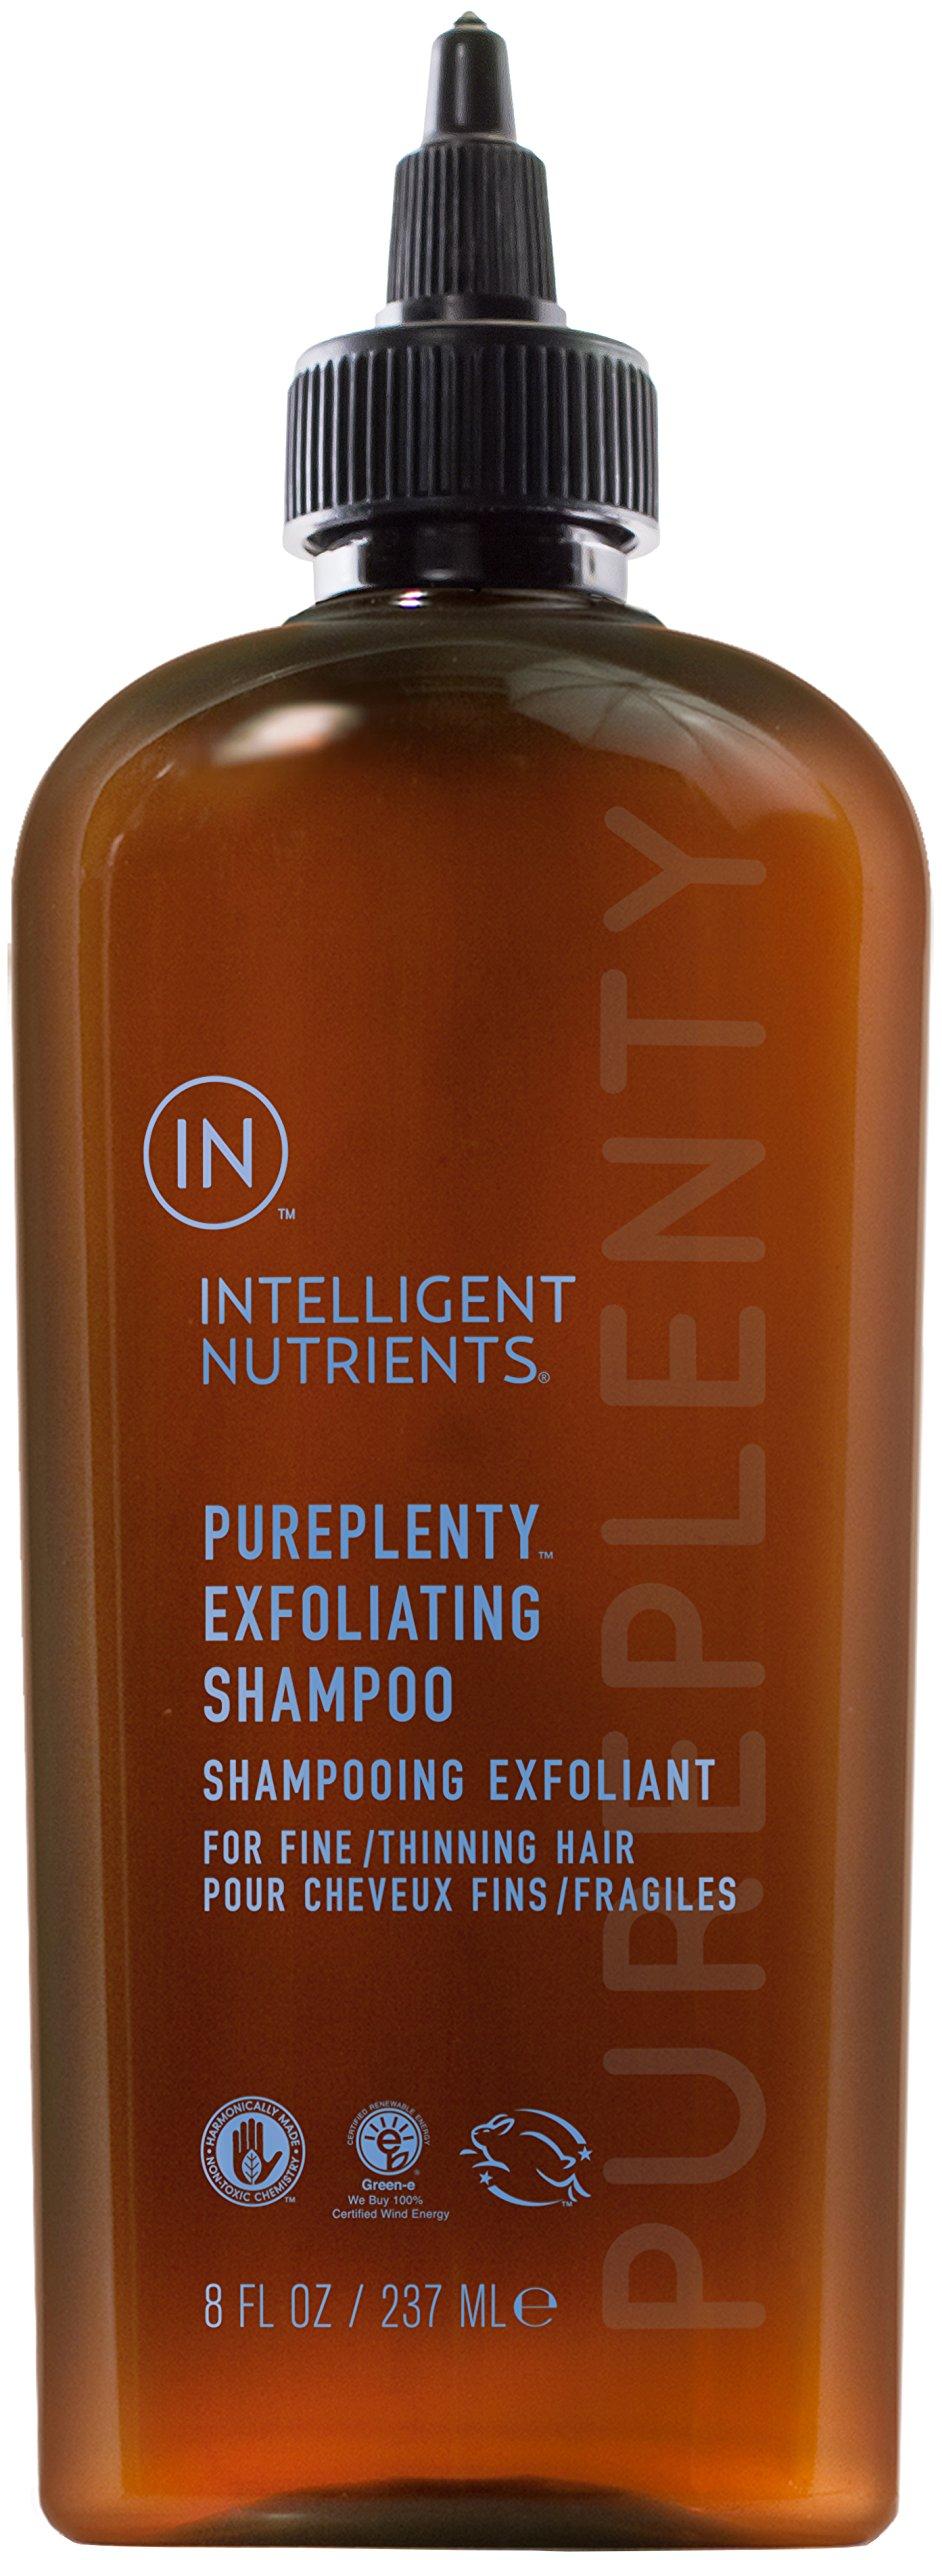 Intelligent Nutrients - PurePlenty Exfoliating Shampoo for Fine and Thinning Hair, 8oz